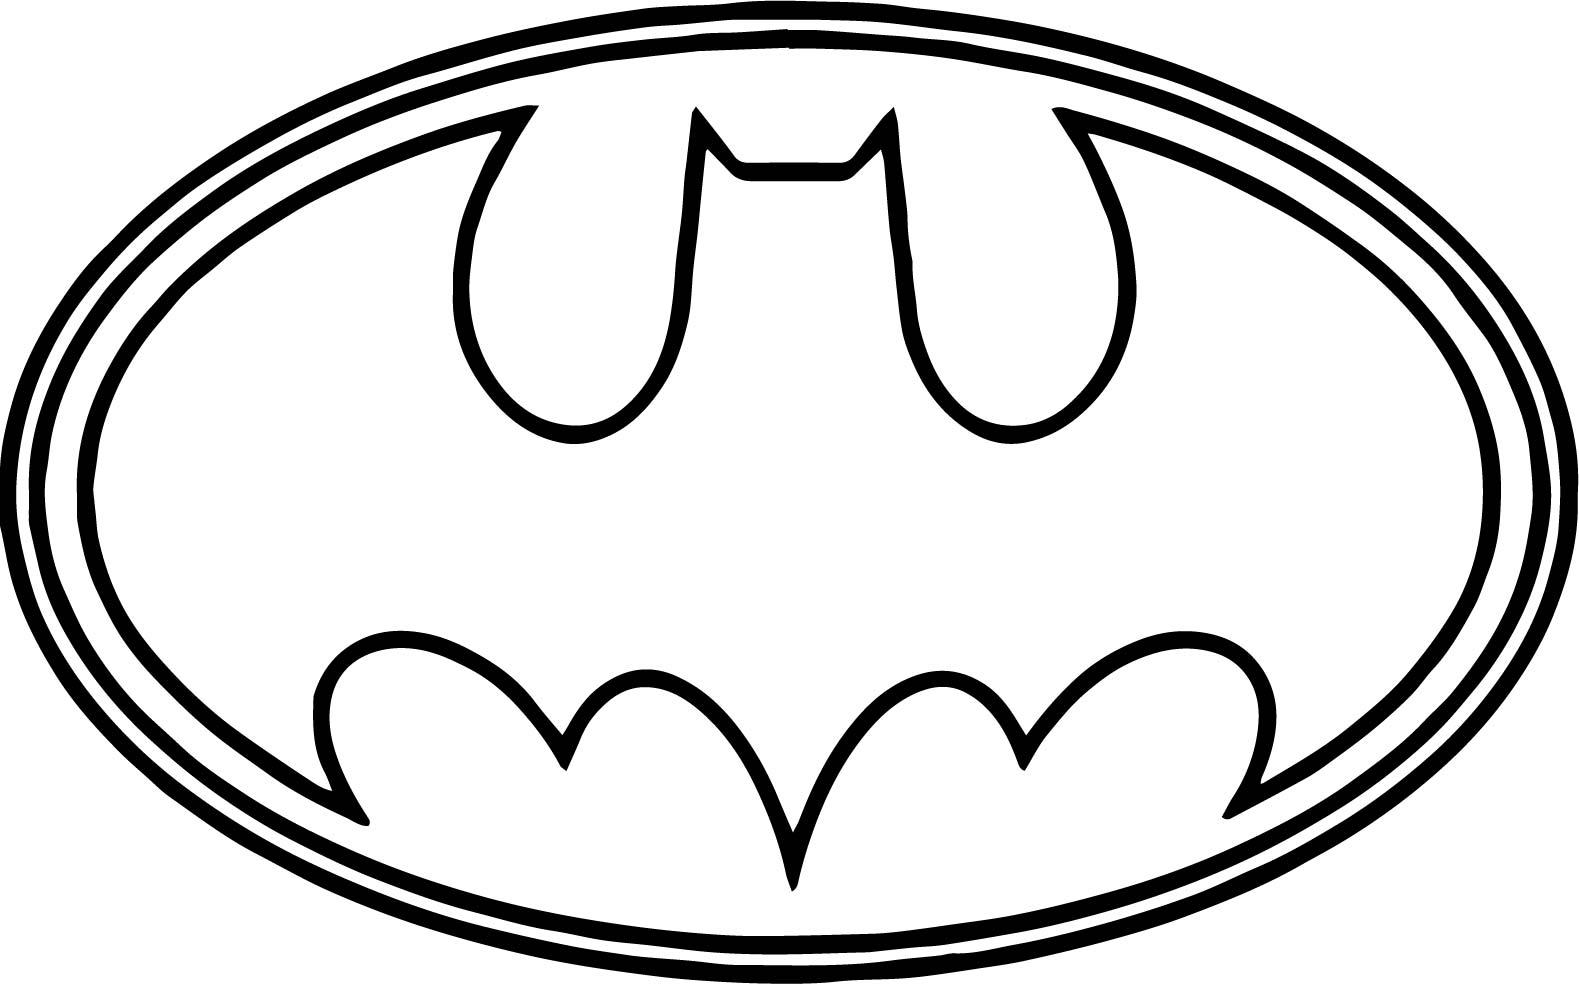 1579x984 Coloring Pages Of Spiderman Symbol Eliolera Com With Batman Logo